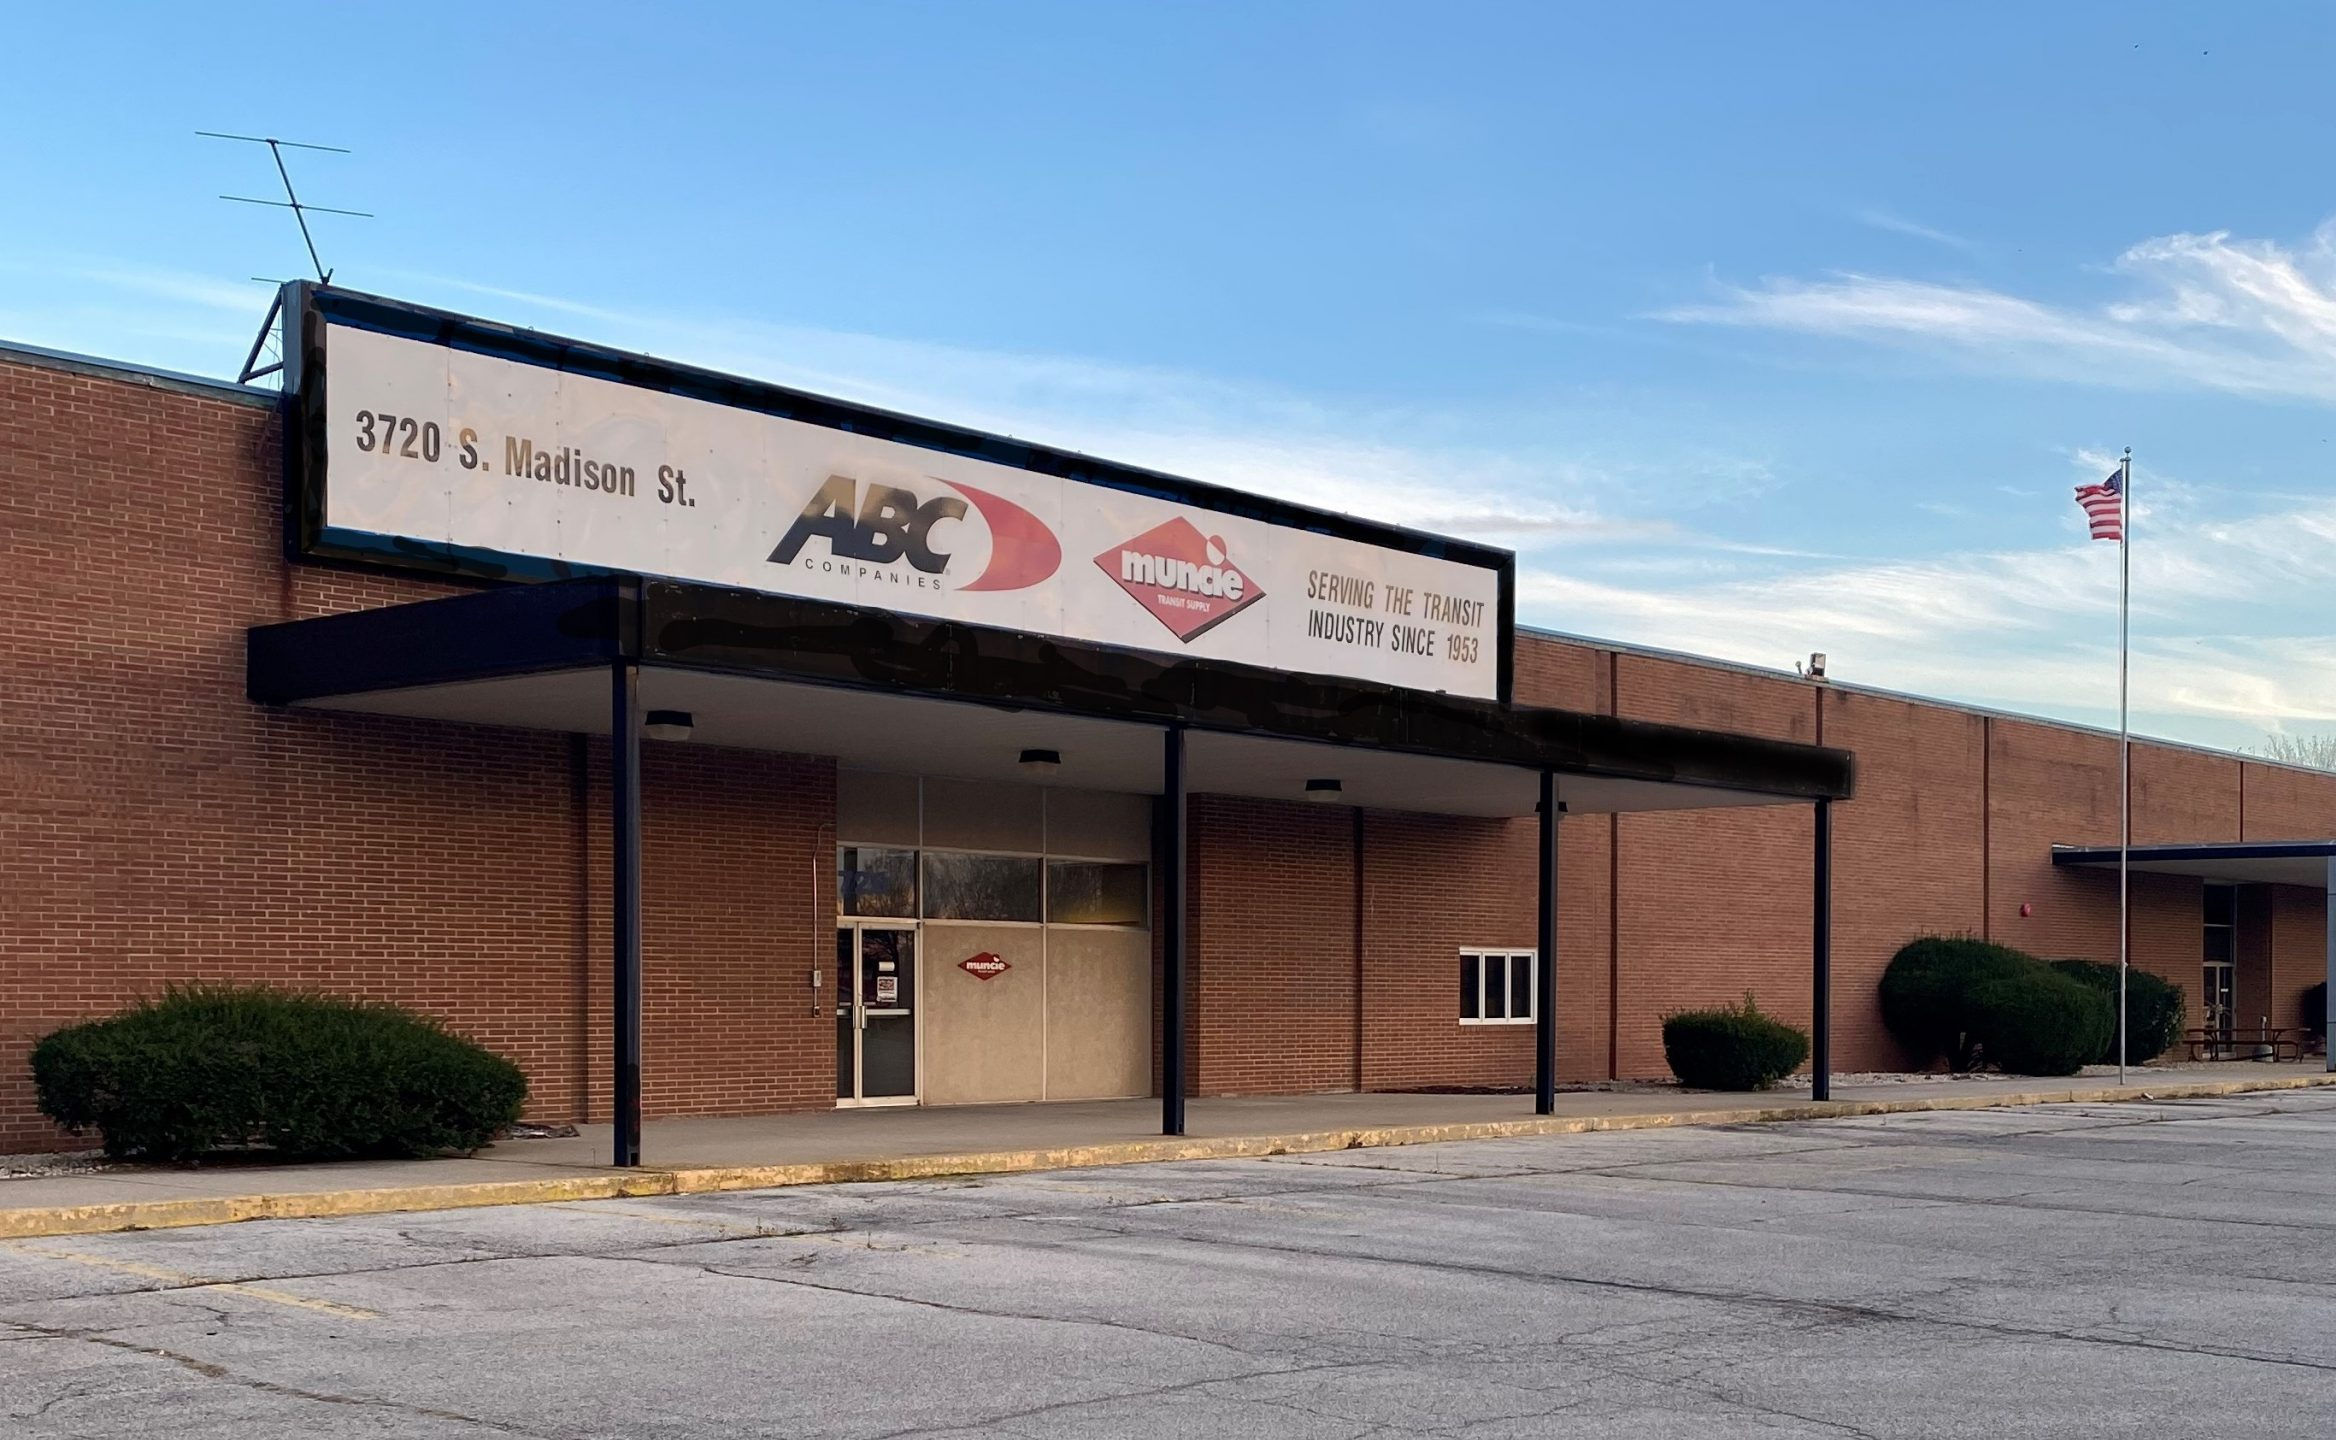 Indiana Location Entrance